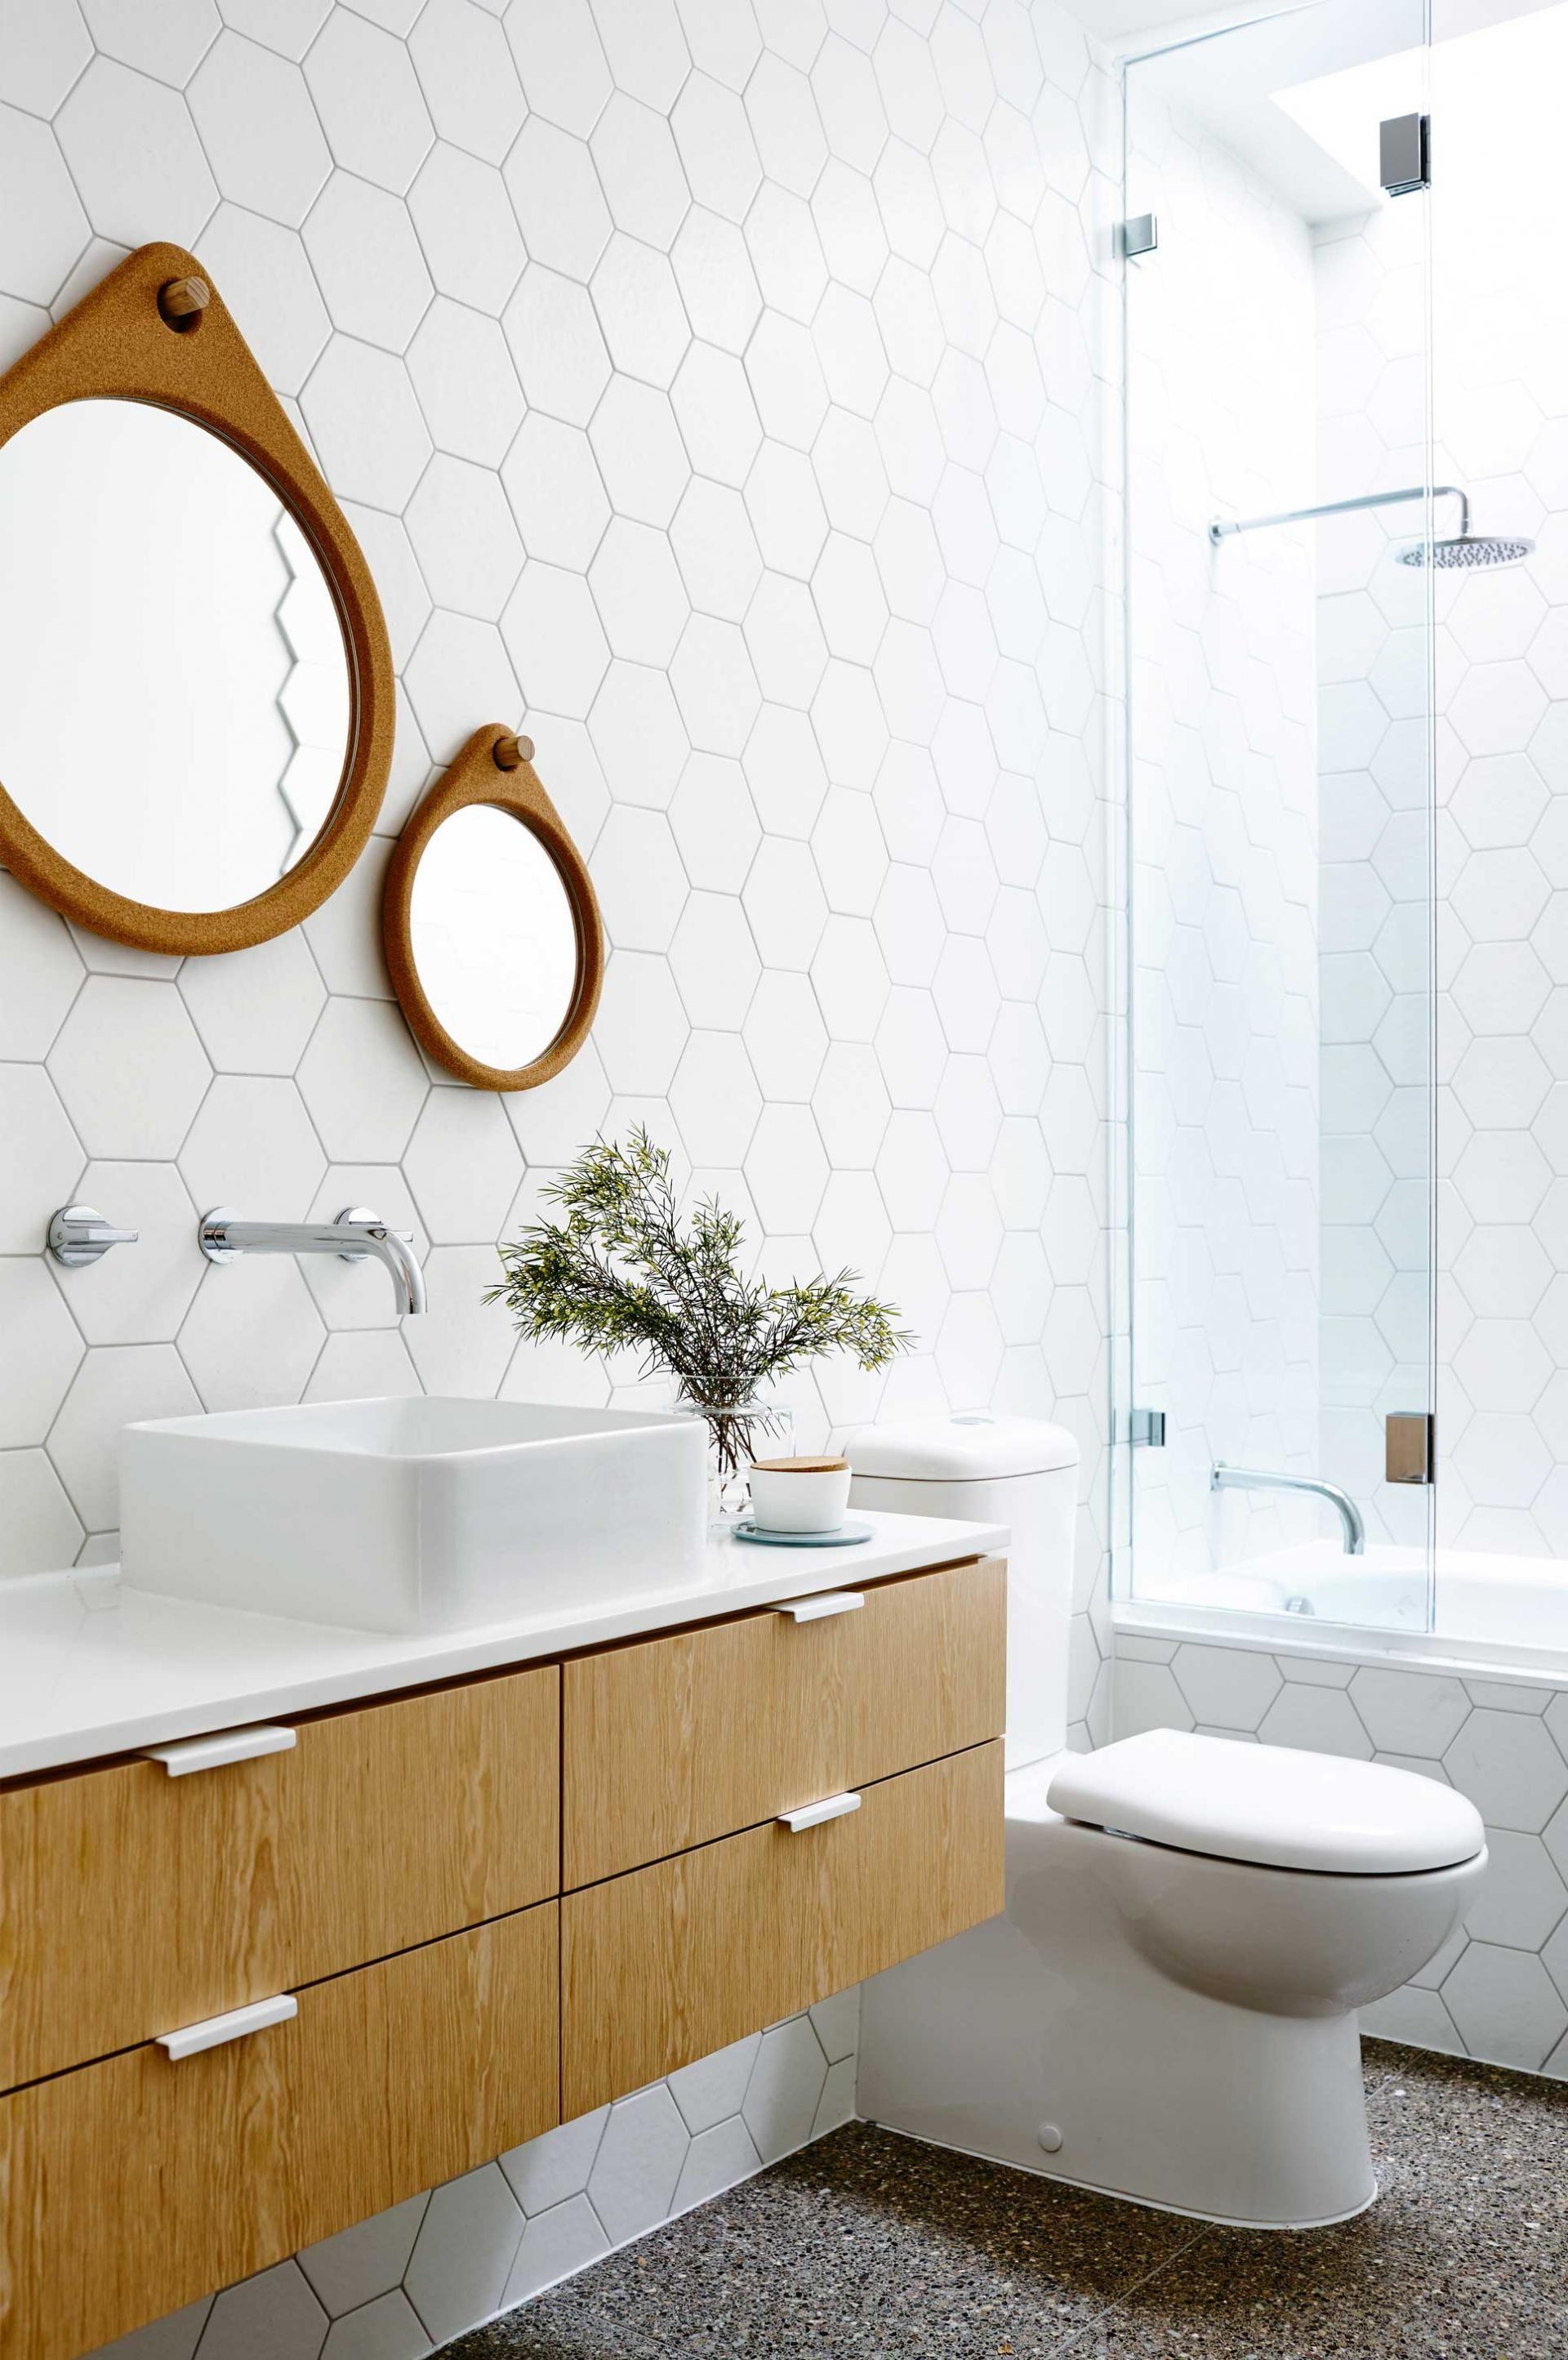 Jan15 Modern White Bathroom Hexagon Tiles Timber Drawers